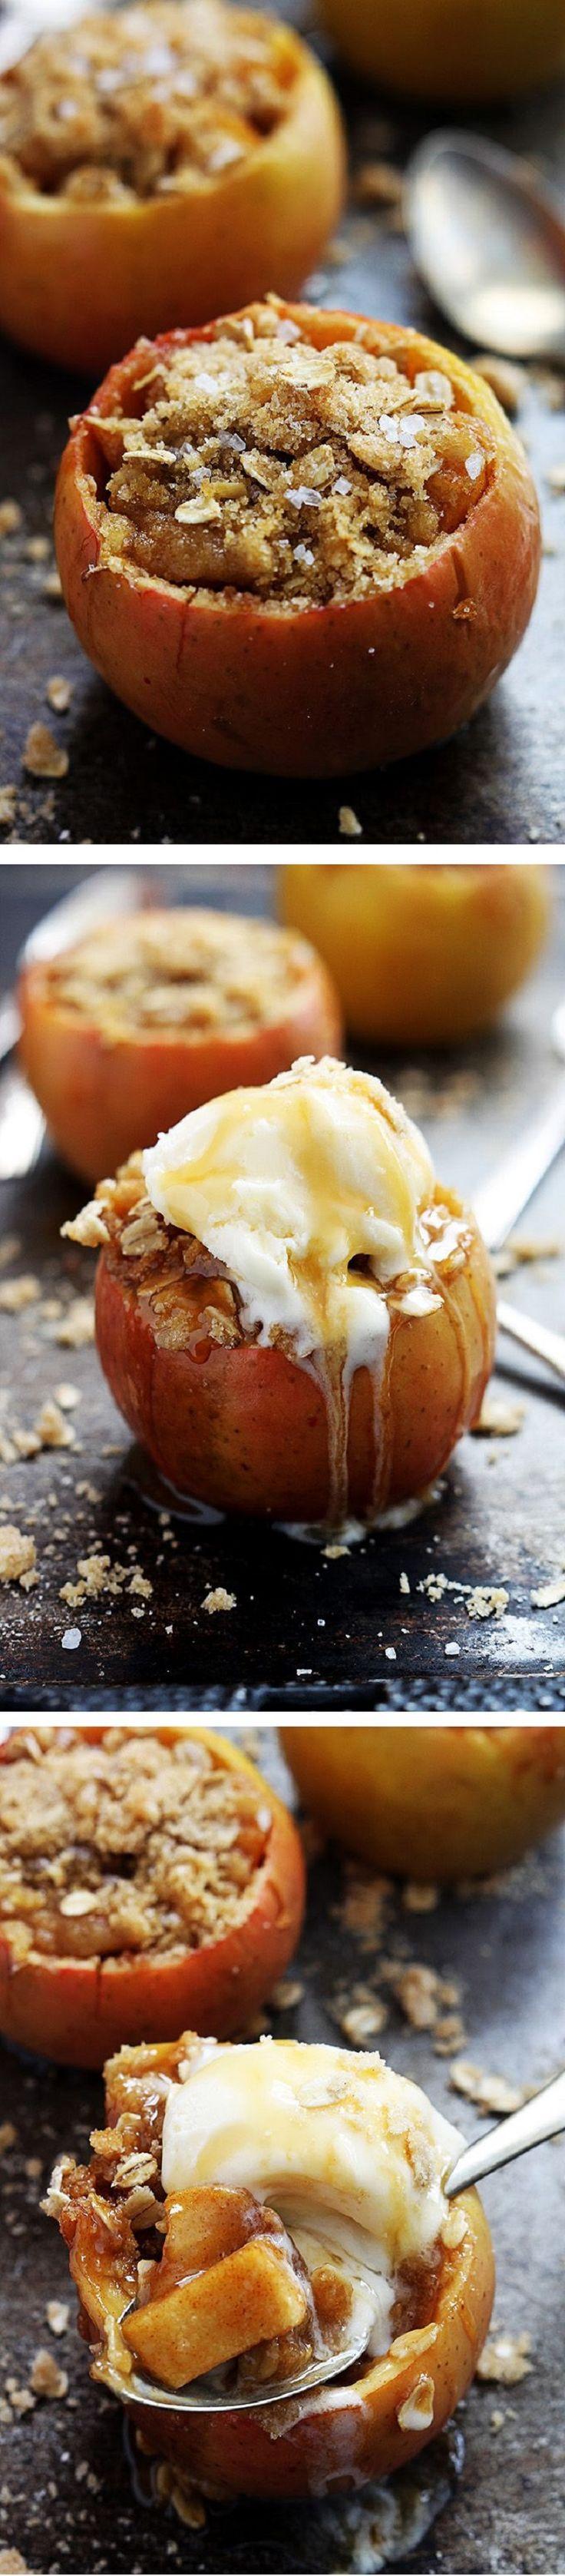 Apple Crisp Stuffed Baked Apples - 15 Sticky-Sweet Baked Fruit Ideas | GleamItUp